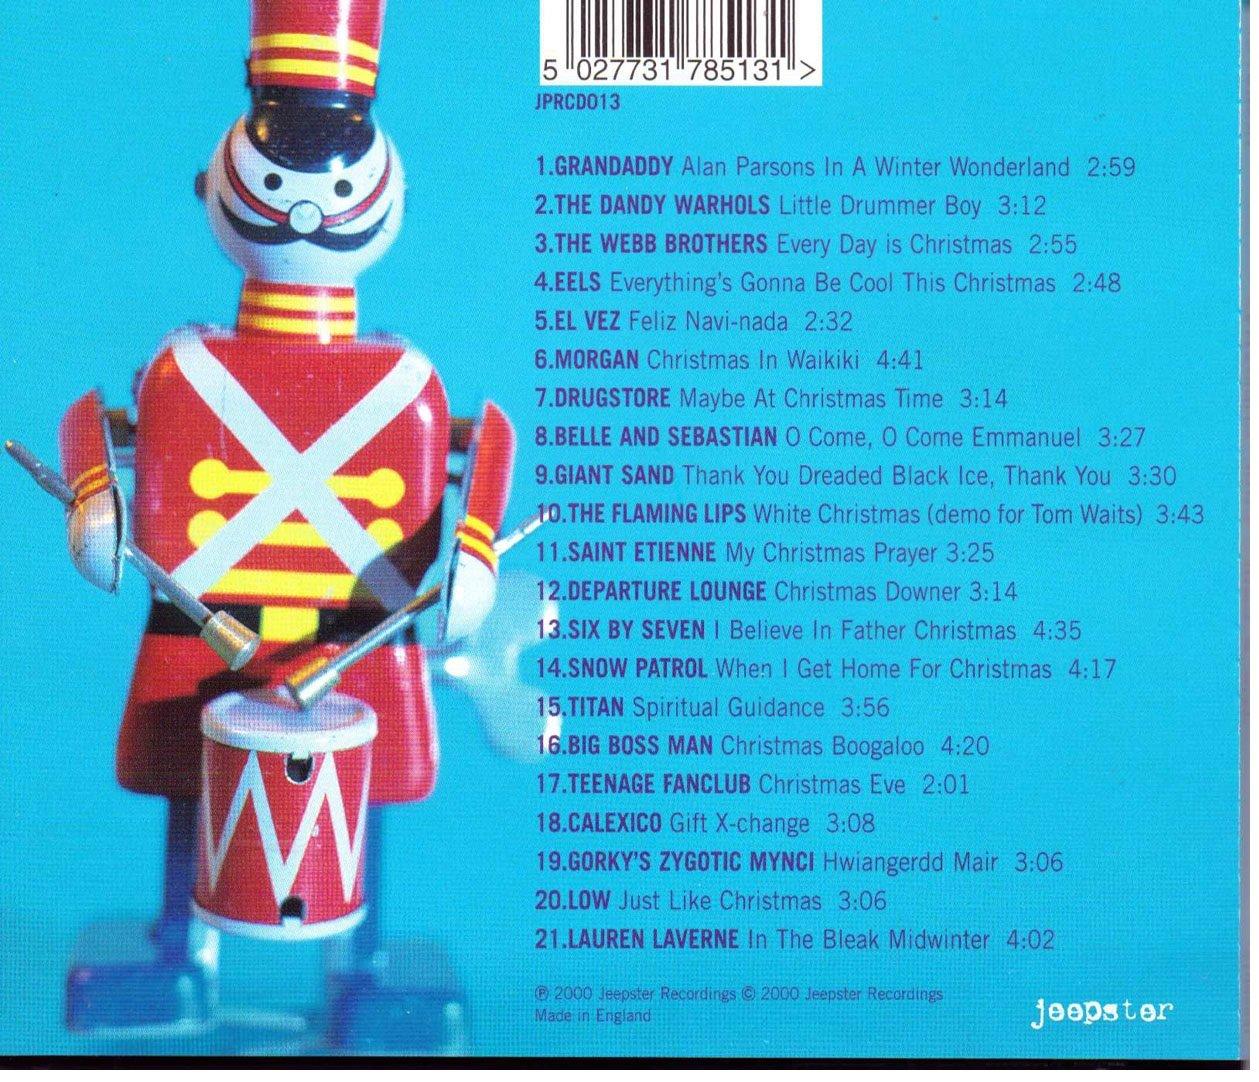 Xfm: It's A Cool, Cool Christmas: Amazon.co.uk: Music